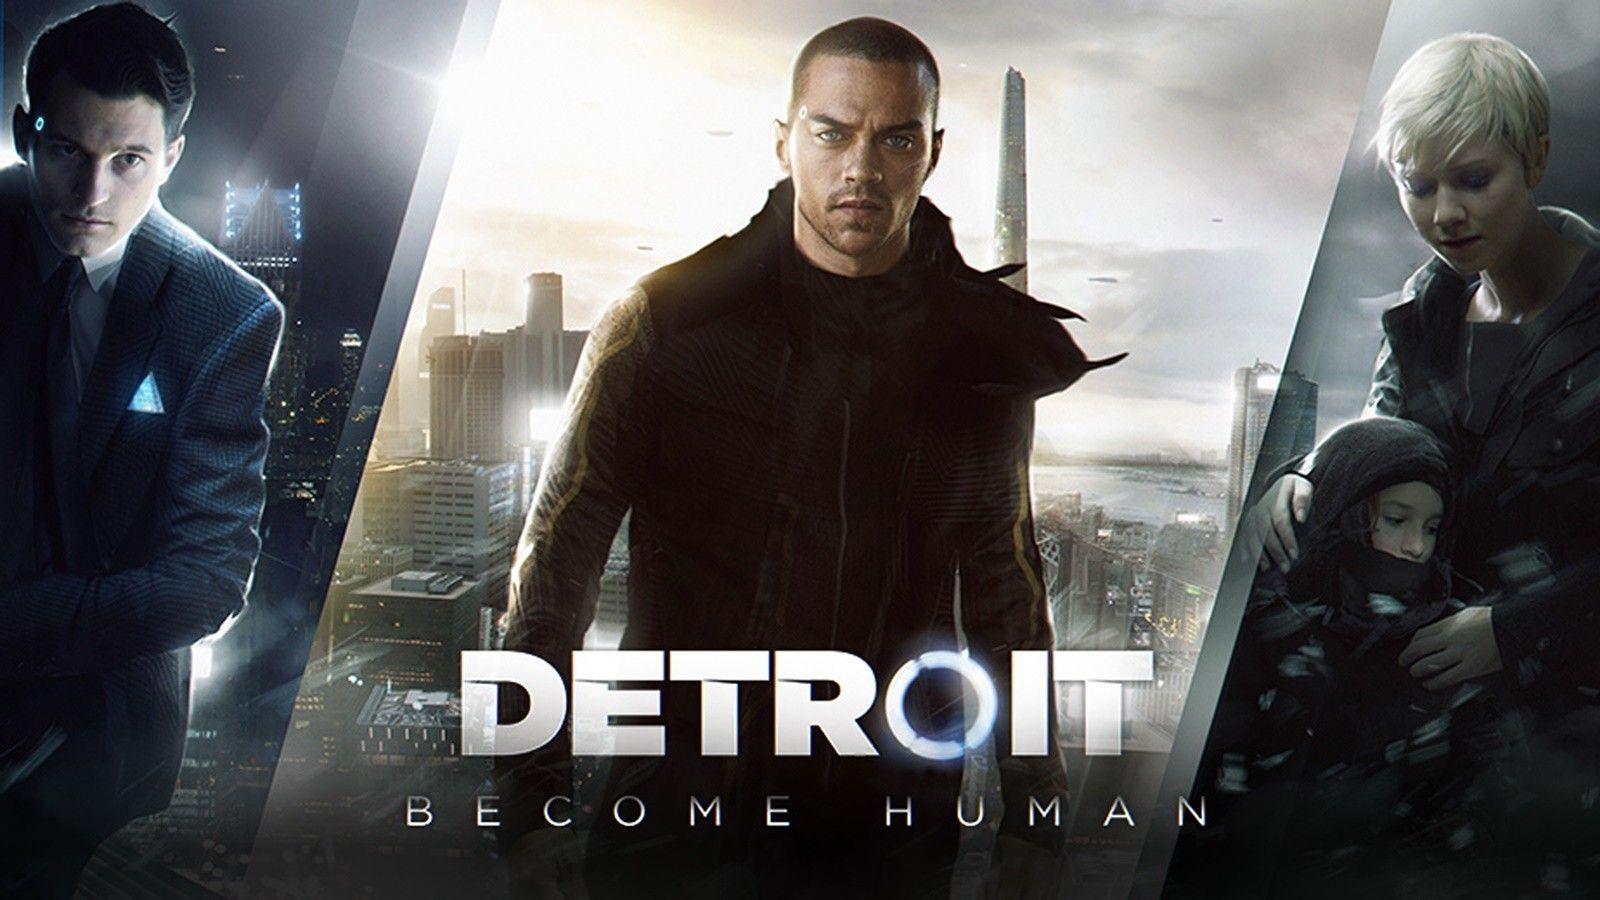 Detroit Become Human Desktop Wallpaper: 'Detroit: Become Human' Download Time: When Can You Start